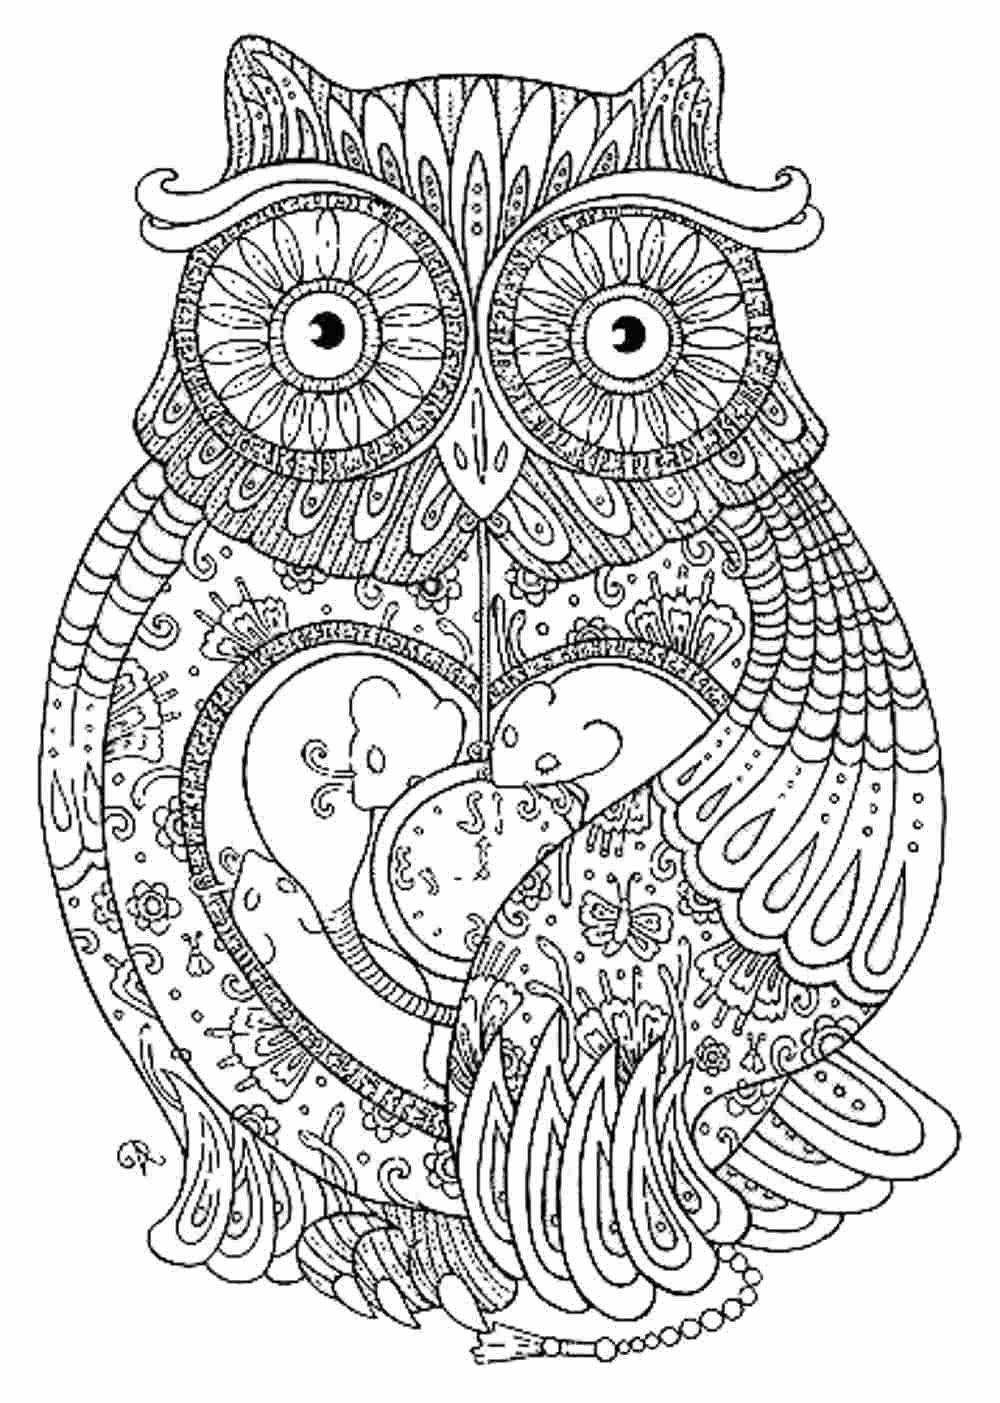 Bird Printable Coloring Pages Elegant Elegant Bird Mandala Coloring Pages Tintuc247 Wallpaper Vintage Wallpaper Iphone Wallpaper Ipad